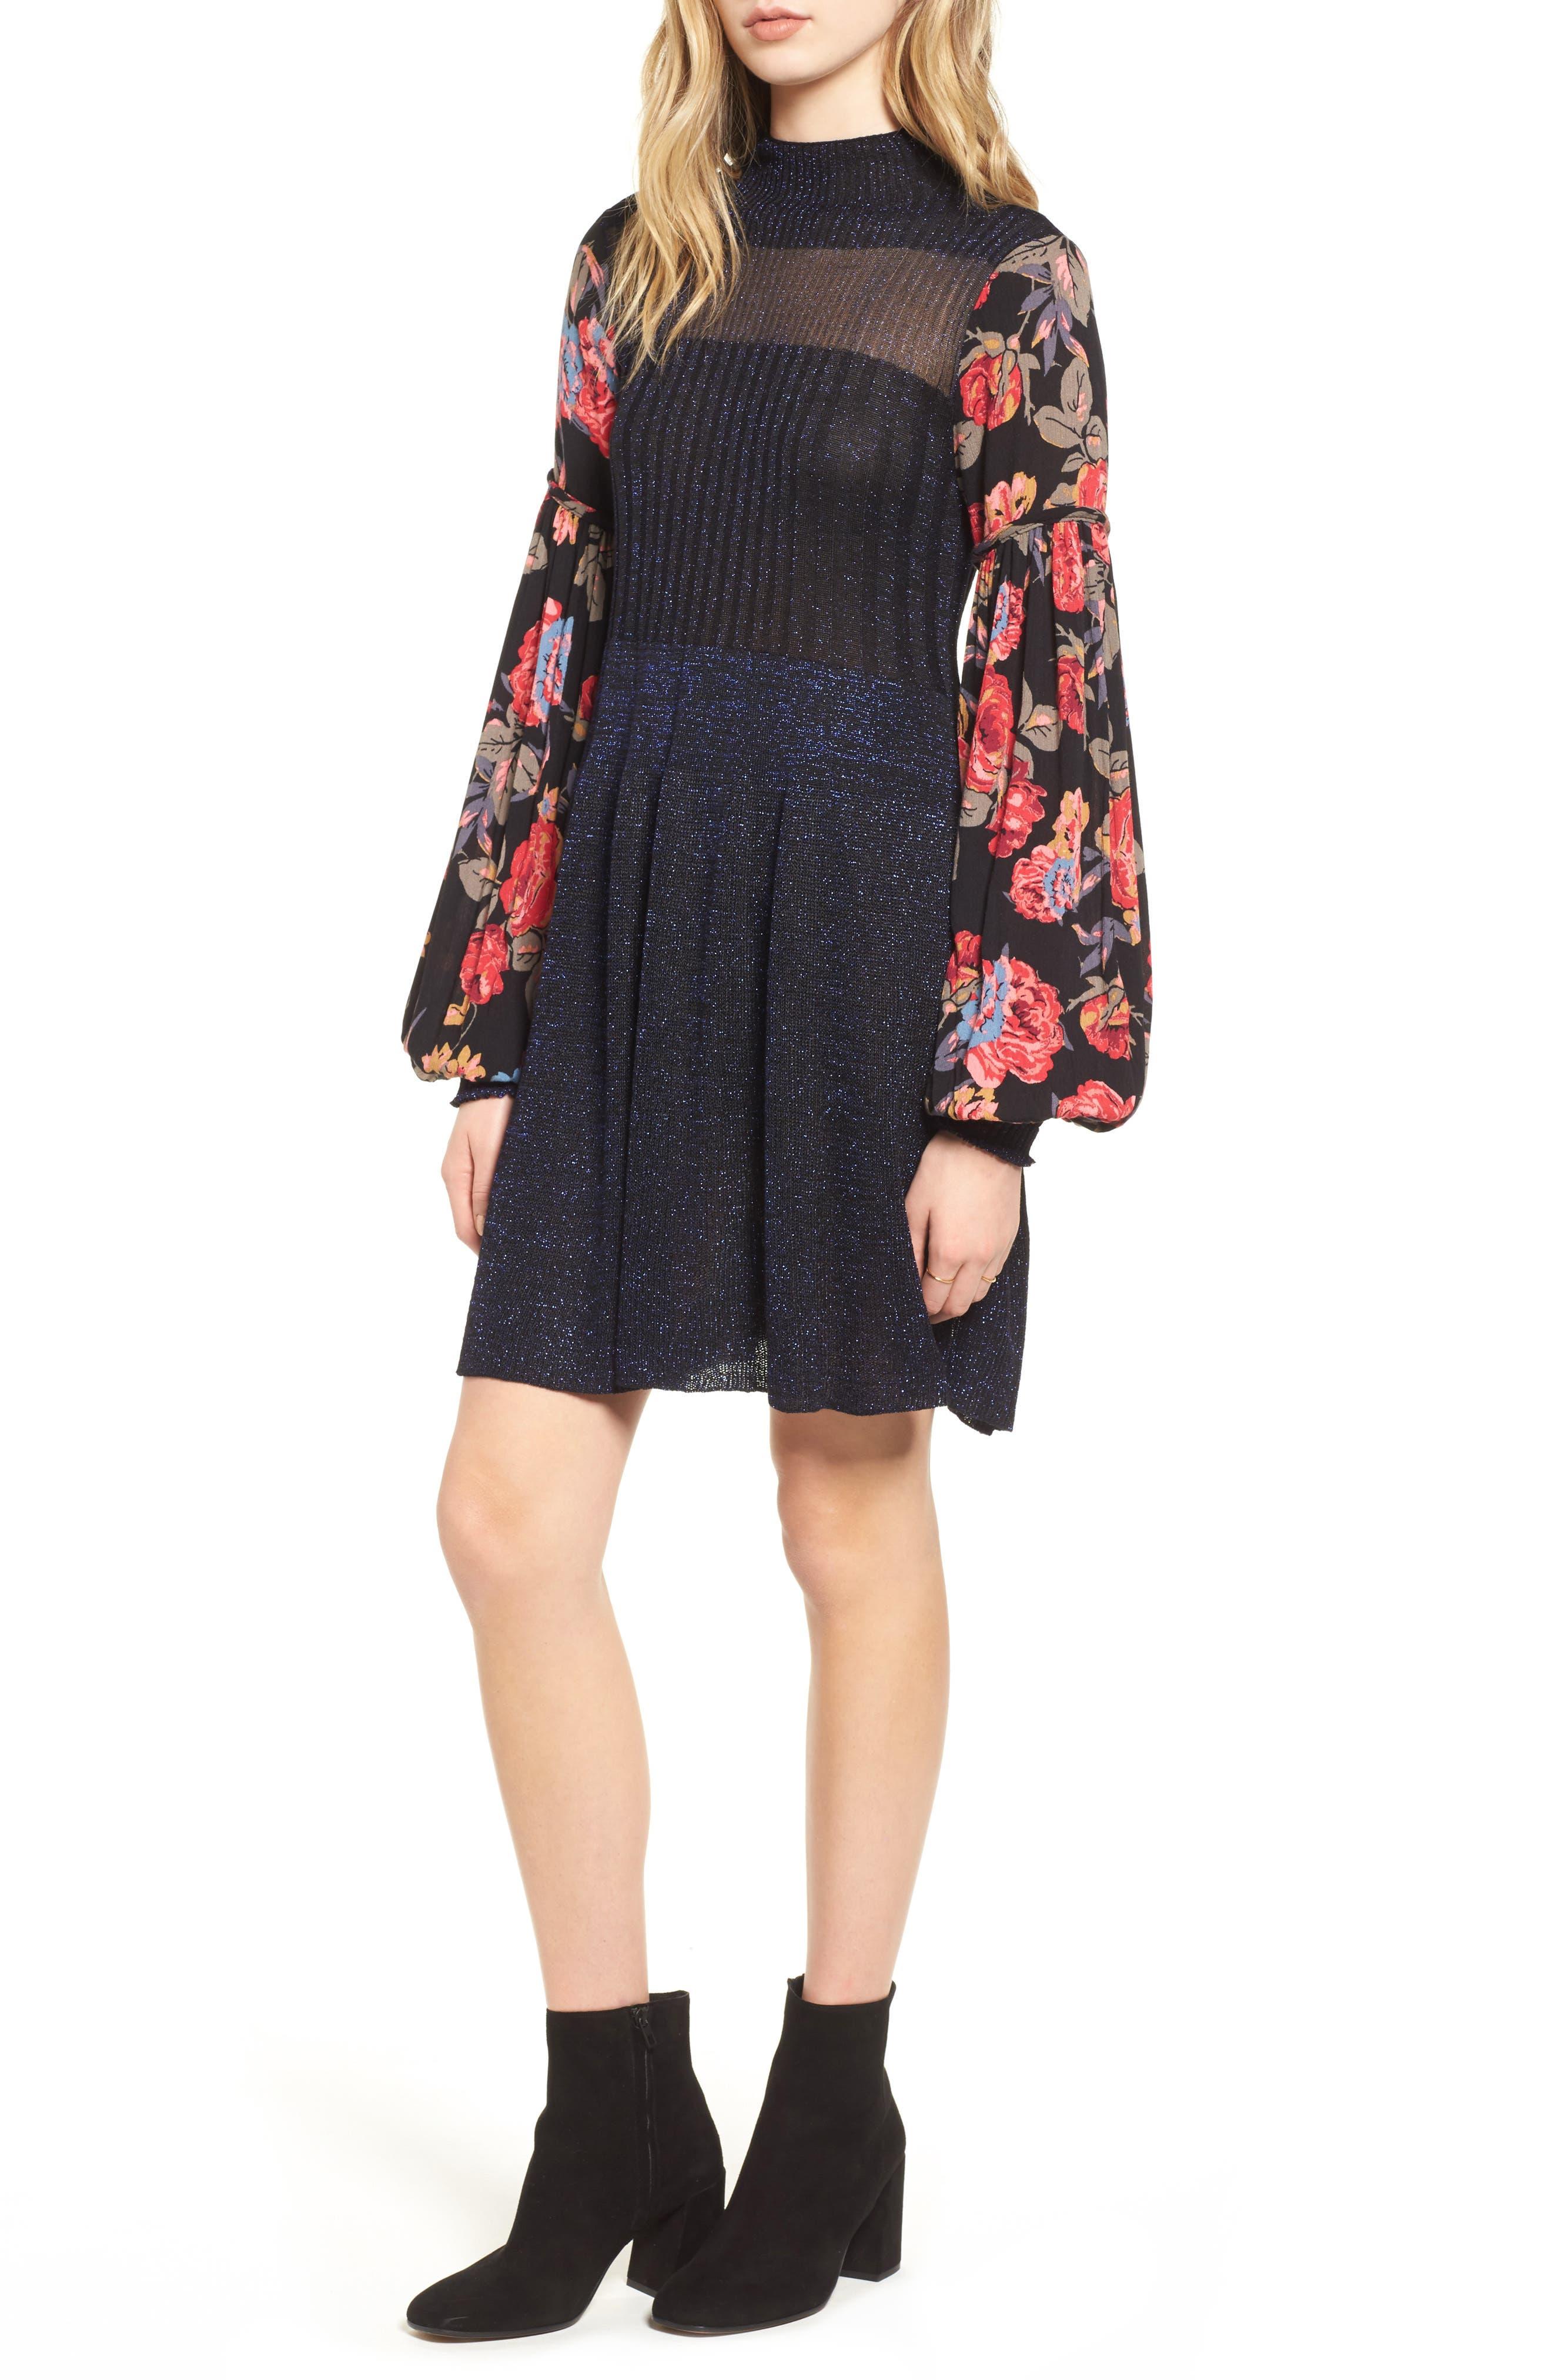 Rose & Shine Sweater Dress,                         Main,                         color, Black Combo